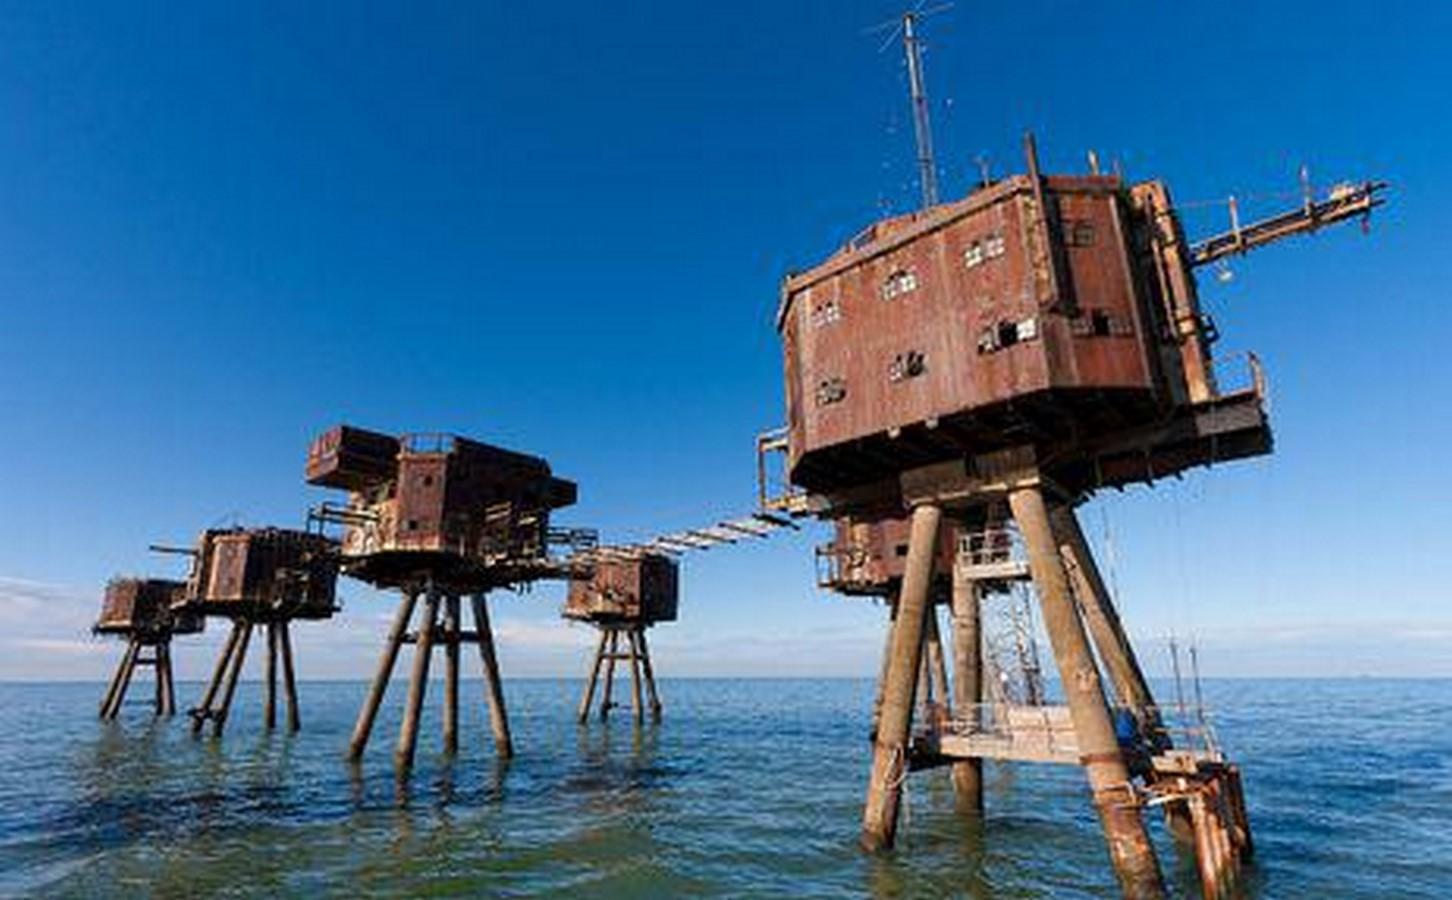 Maunsell Sea Forts - United Kingdom - Sheet2